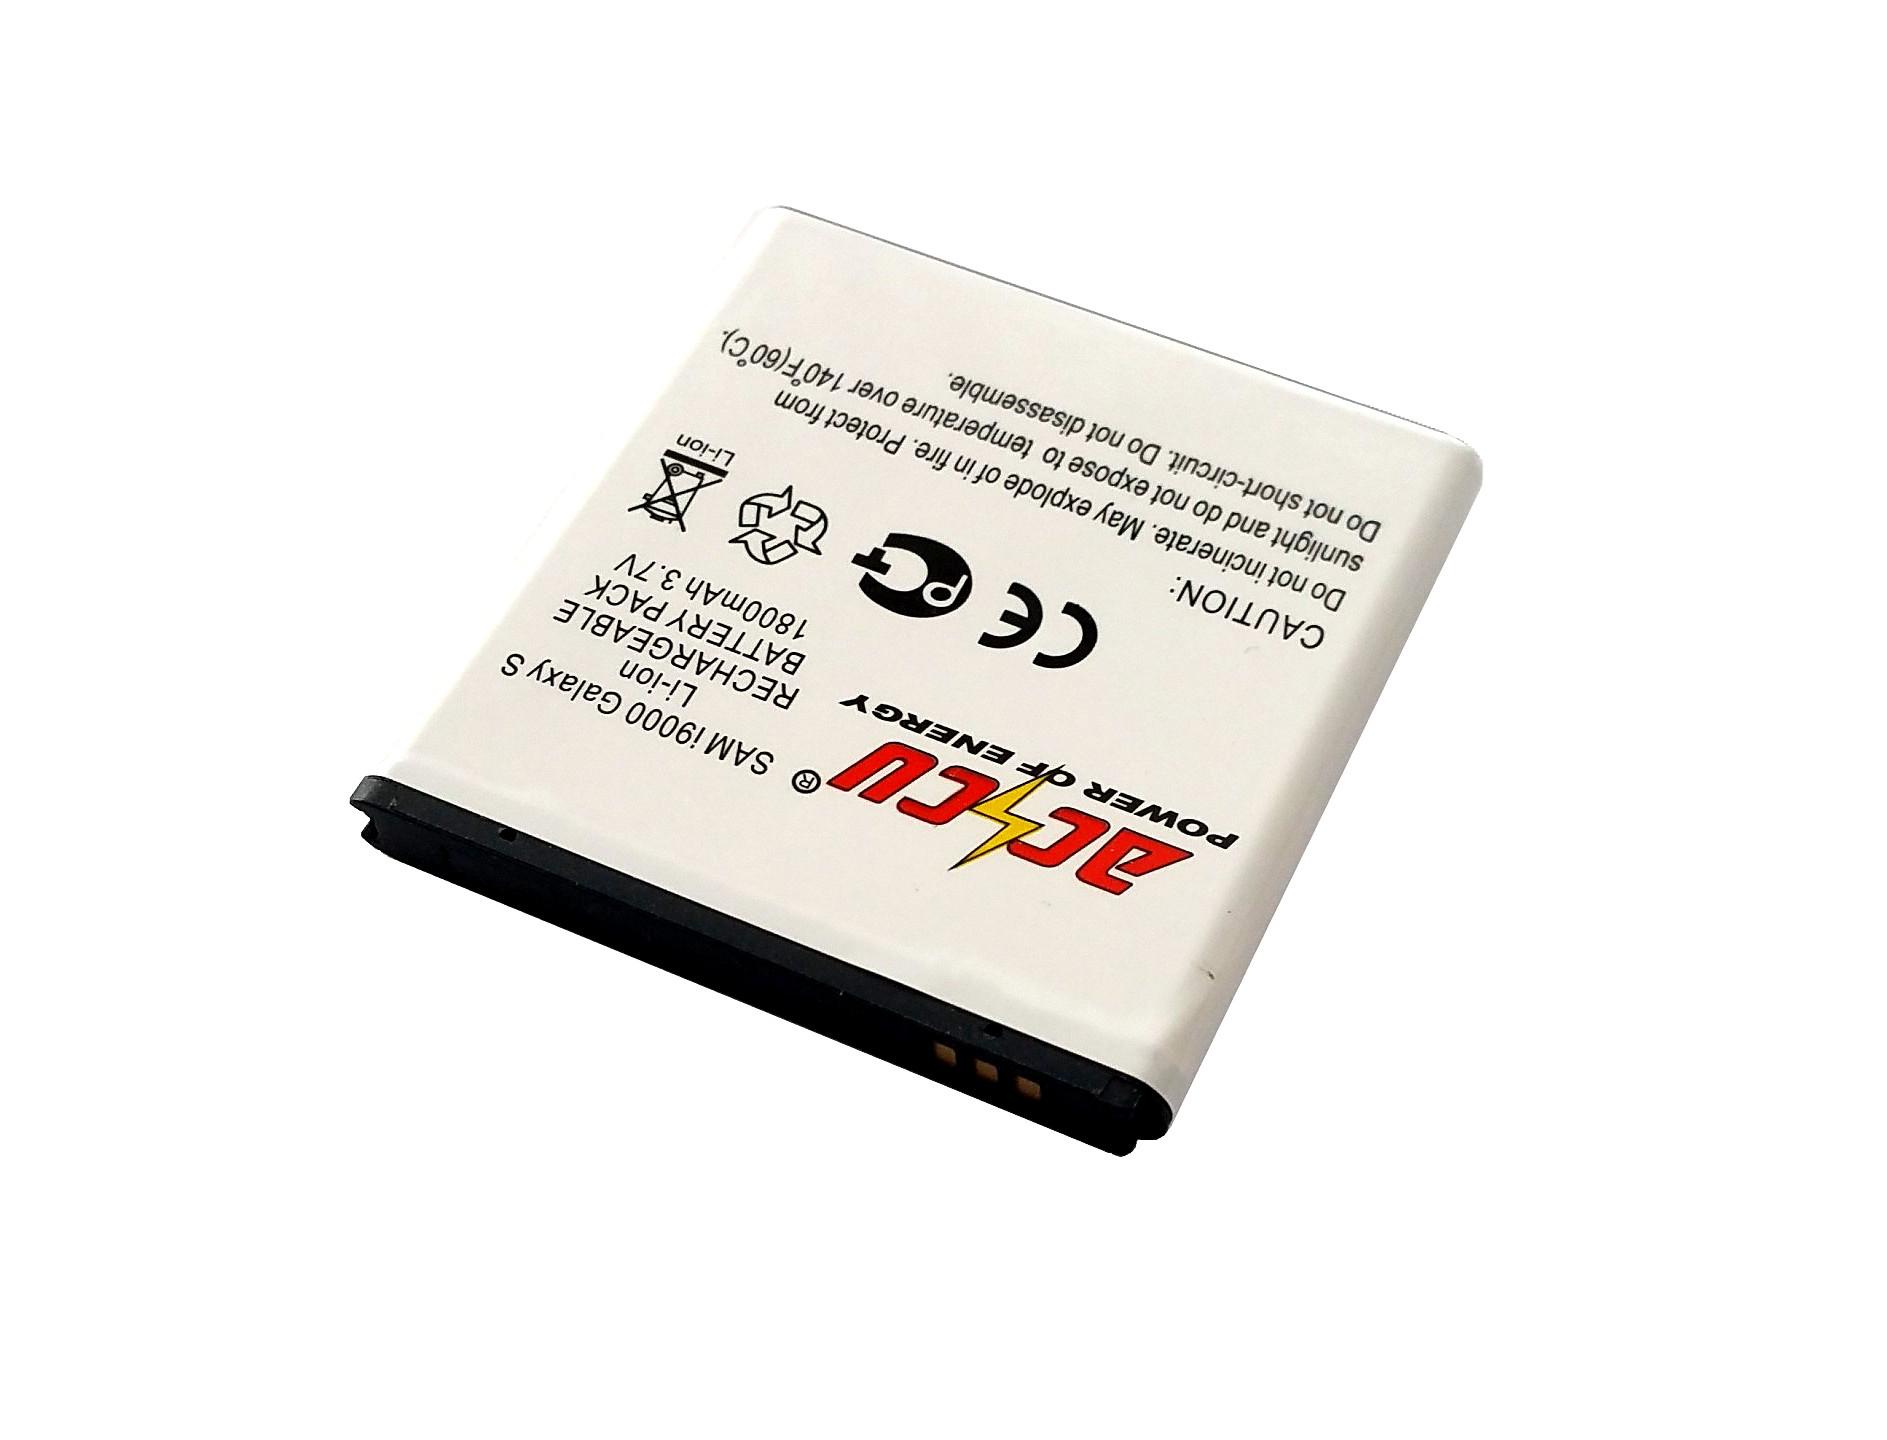 Baterie Accu pro Samsung Galaxy S, Li-ion, 1800mAh